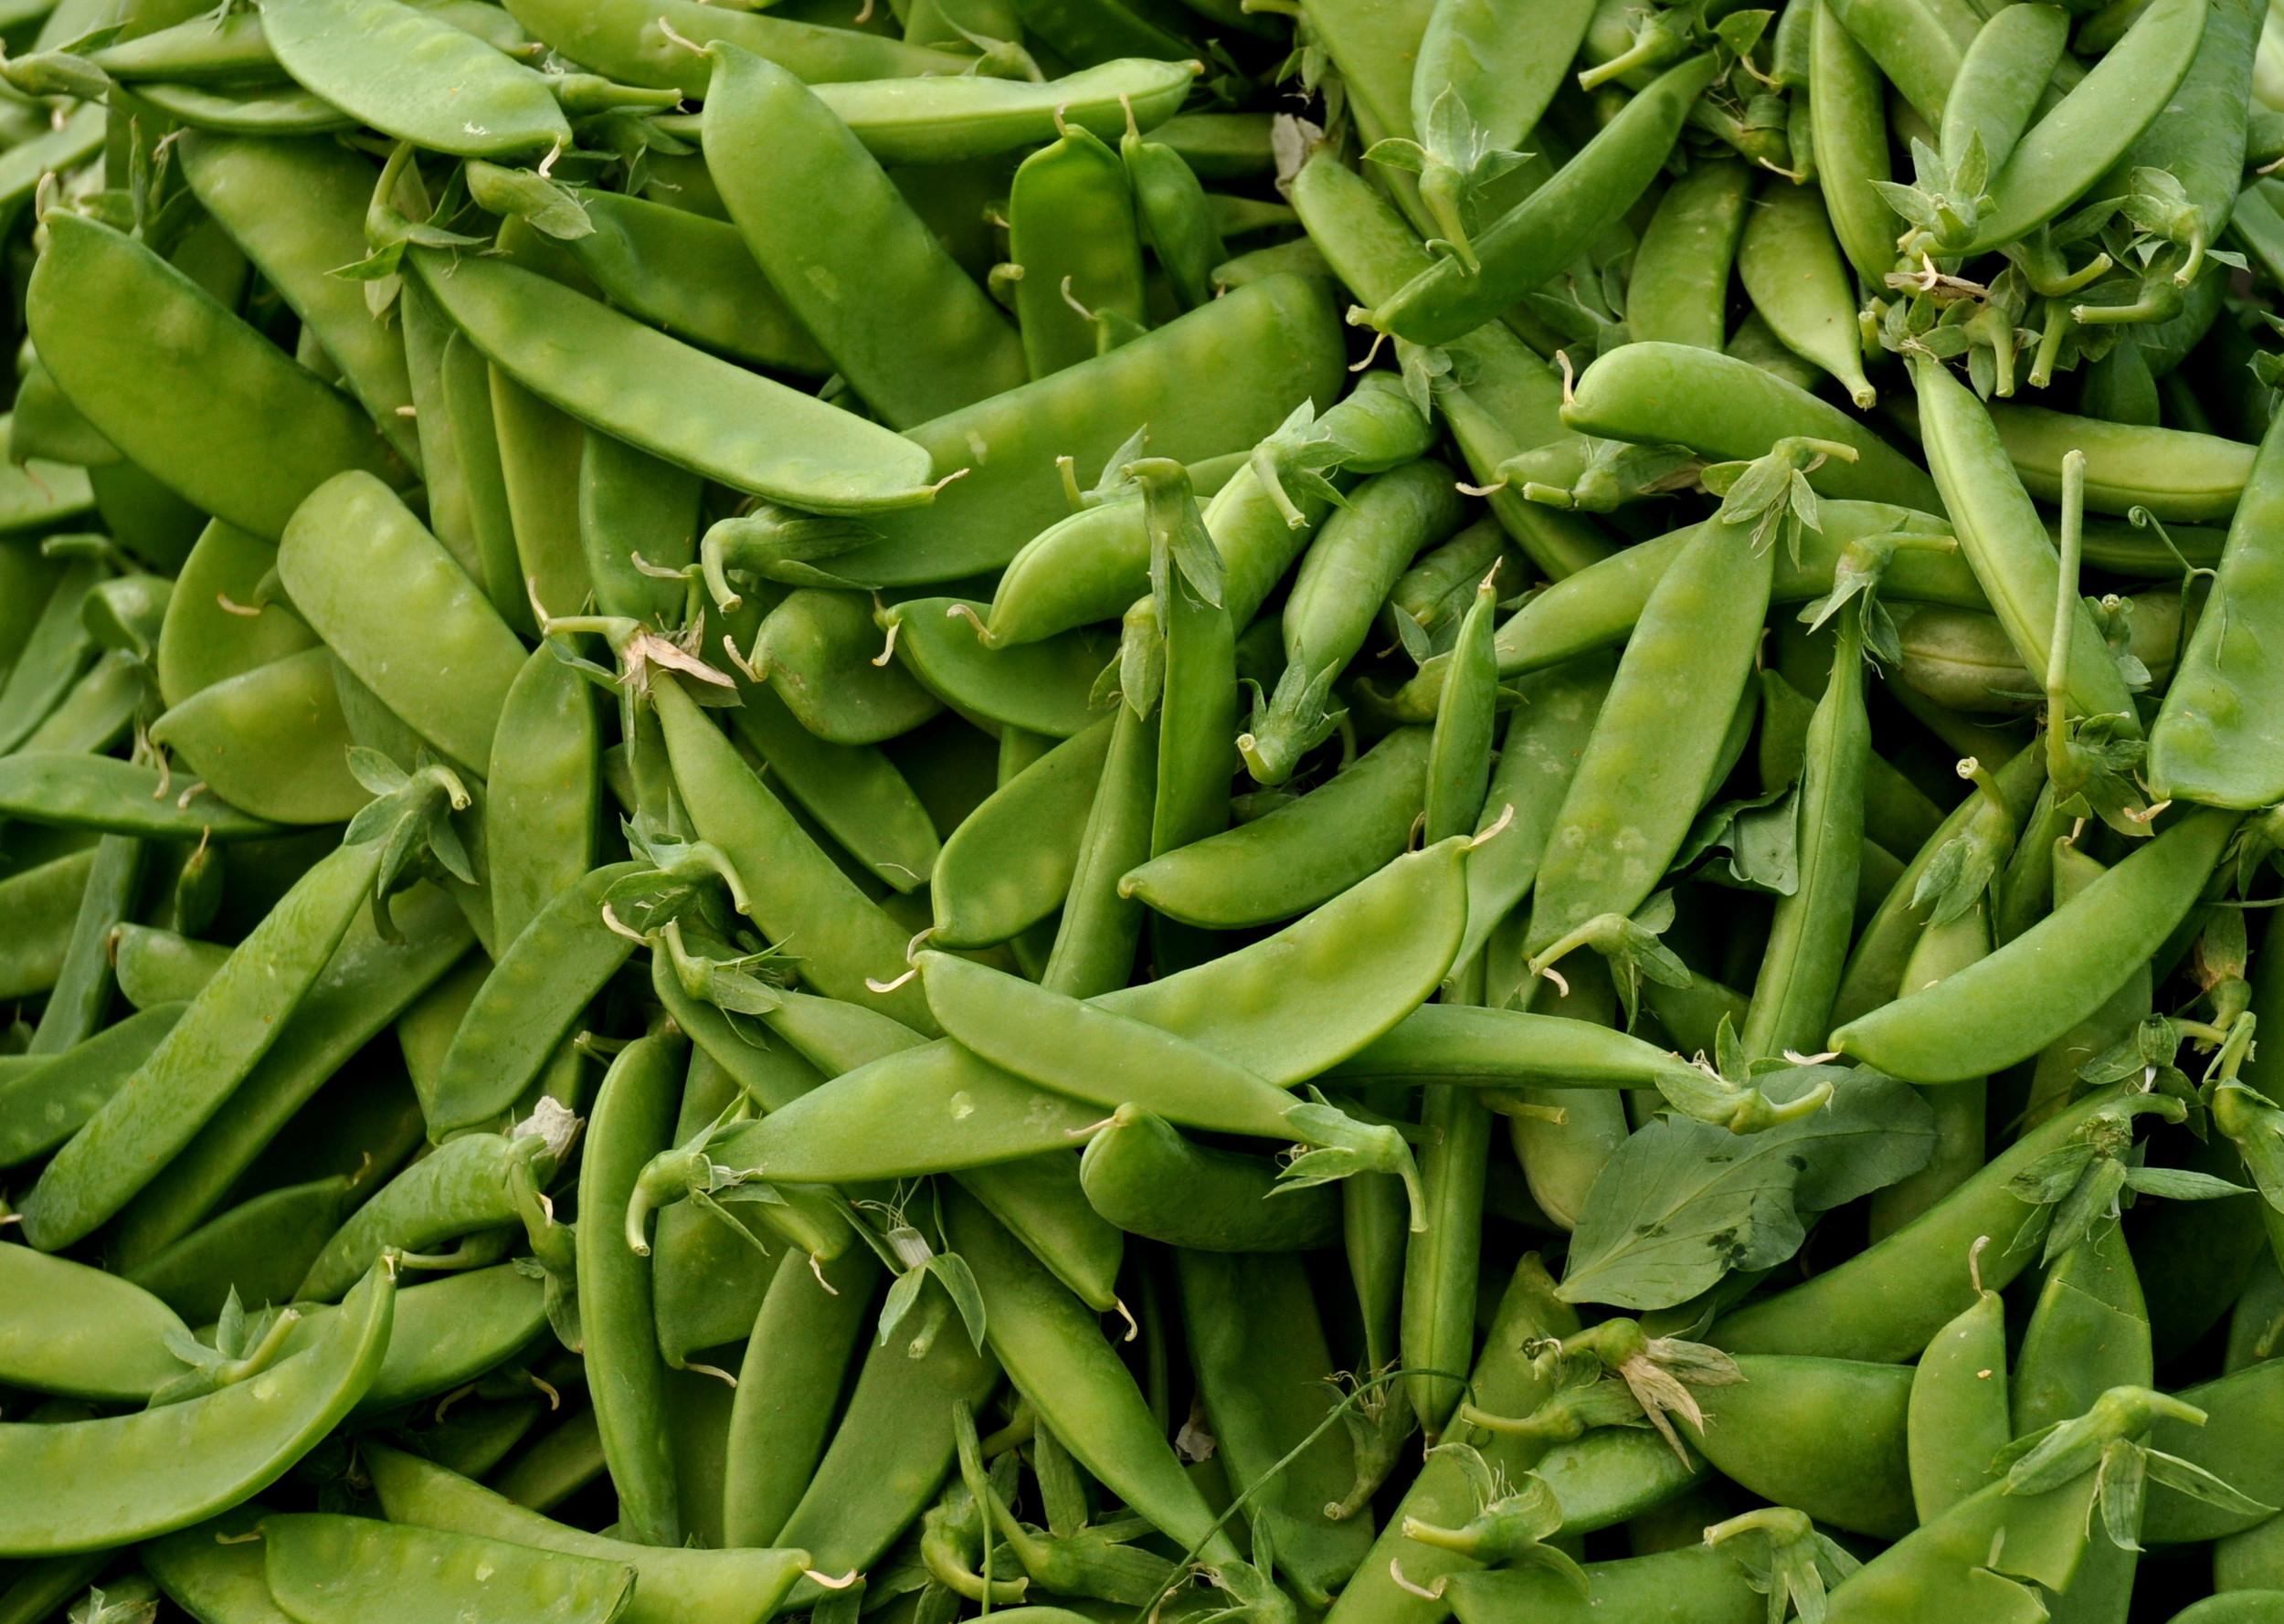 Snow peas from Alvarez Organic Farms. Photo copyright 2014 by Zachary D. Lyons.